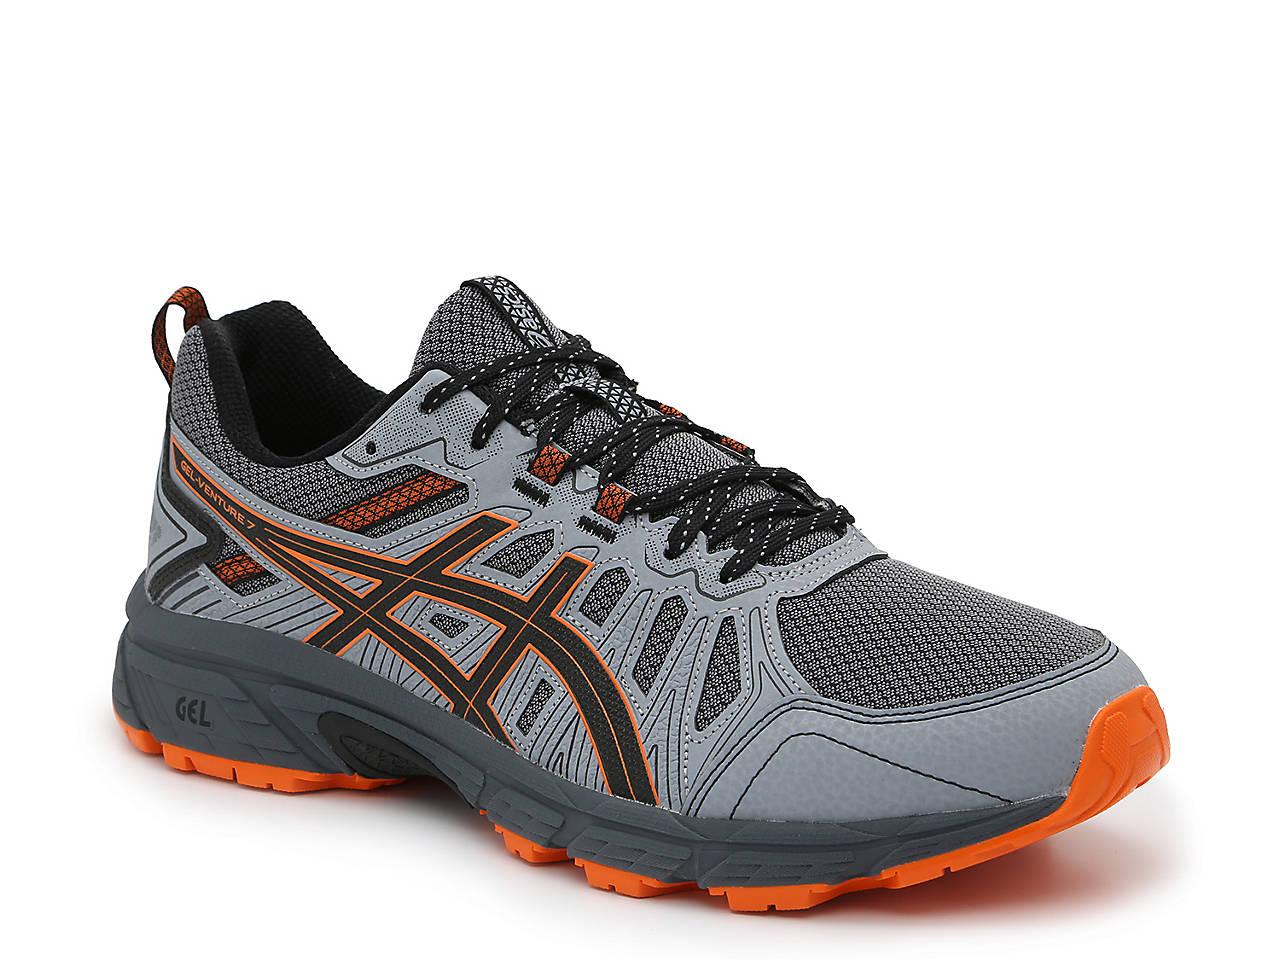 ASICS GEL Venture 7 Trail Running Shoe Men's Men's Shoes DSW  DSW